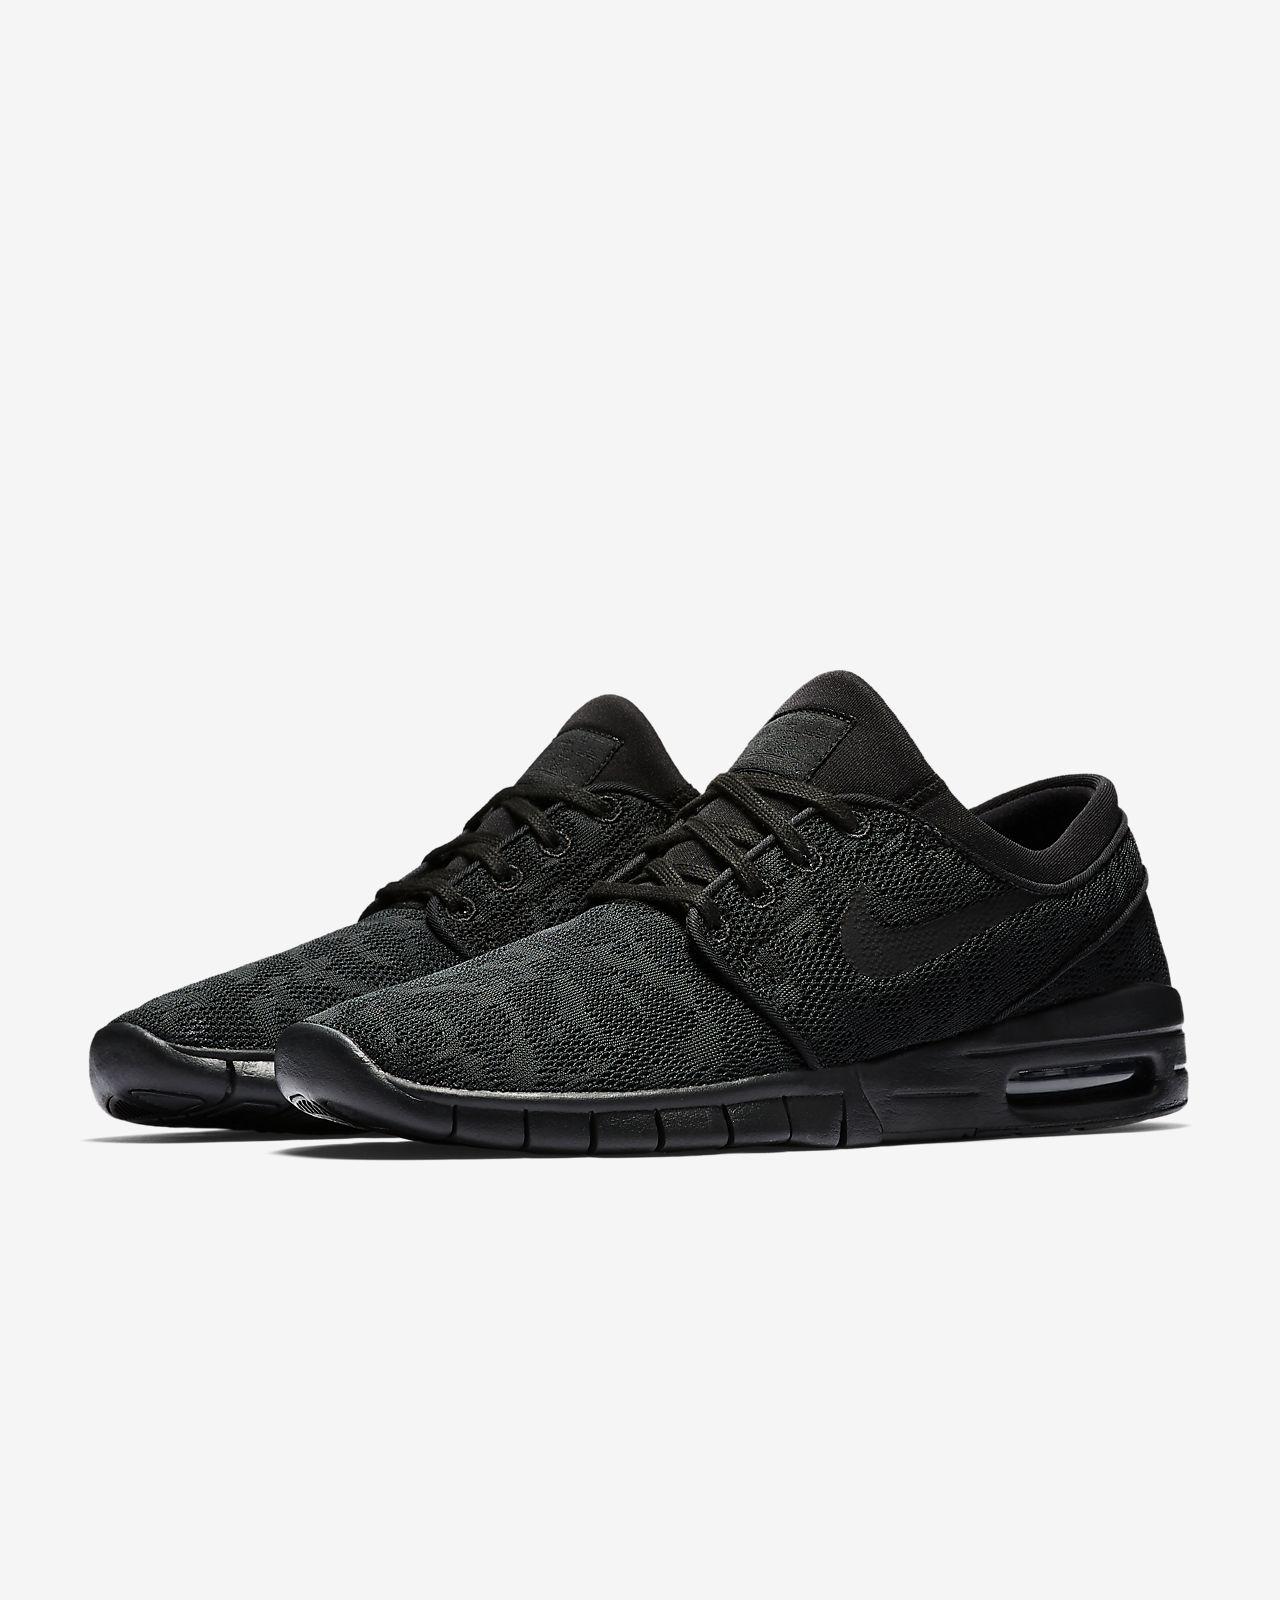 wholesale dealer a990c 4f164 ... Nike SB Stefan Janoski Max Skateschoen